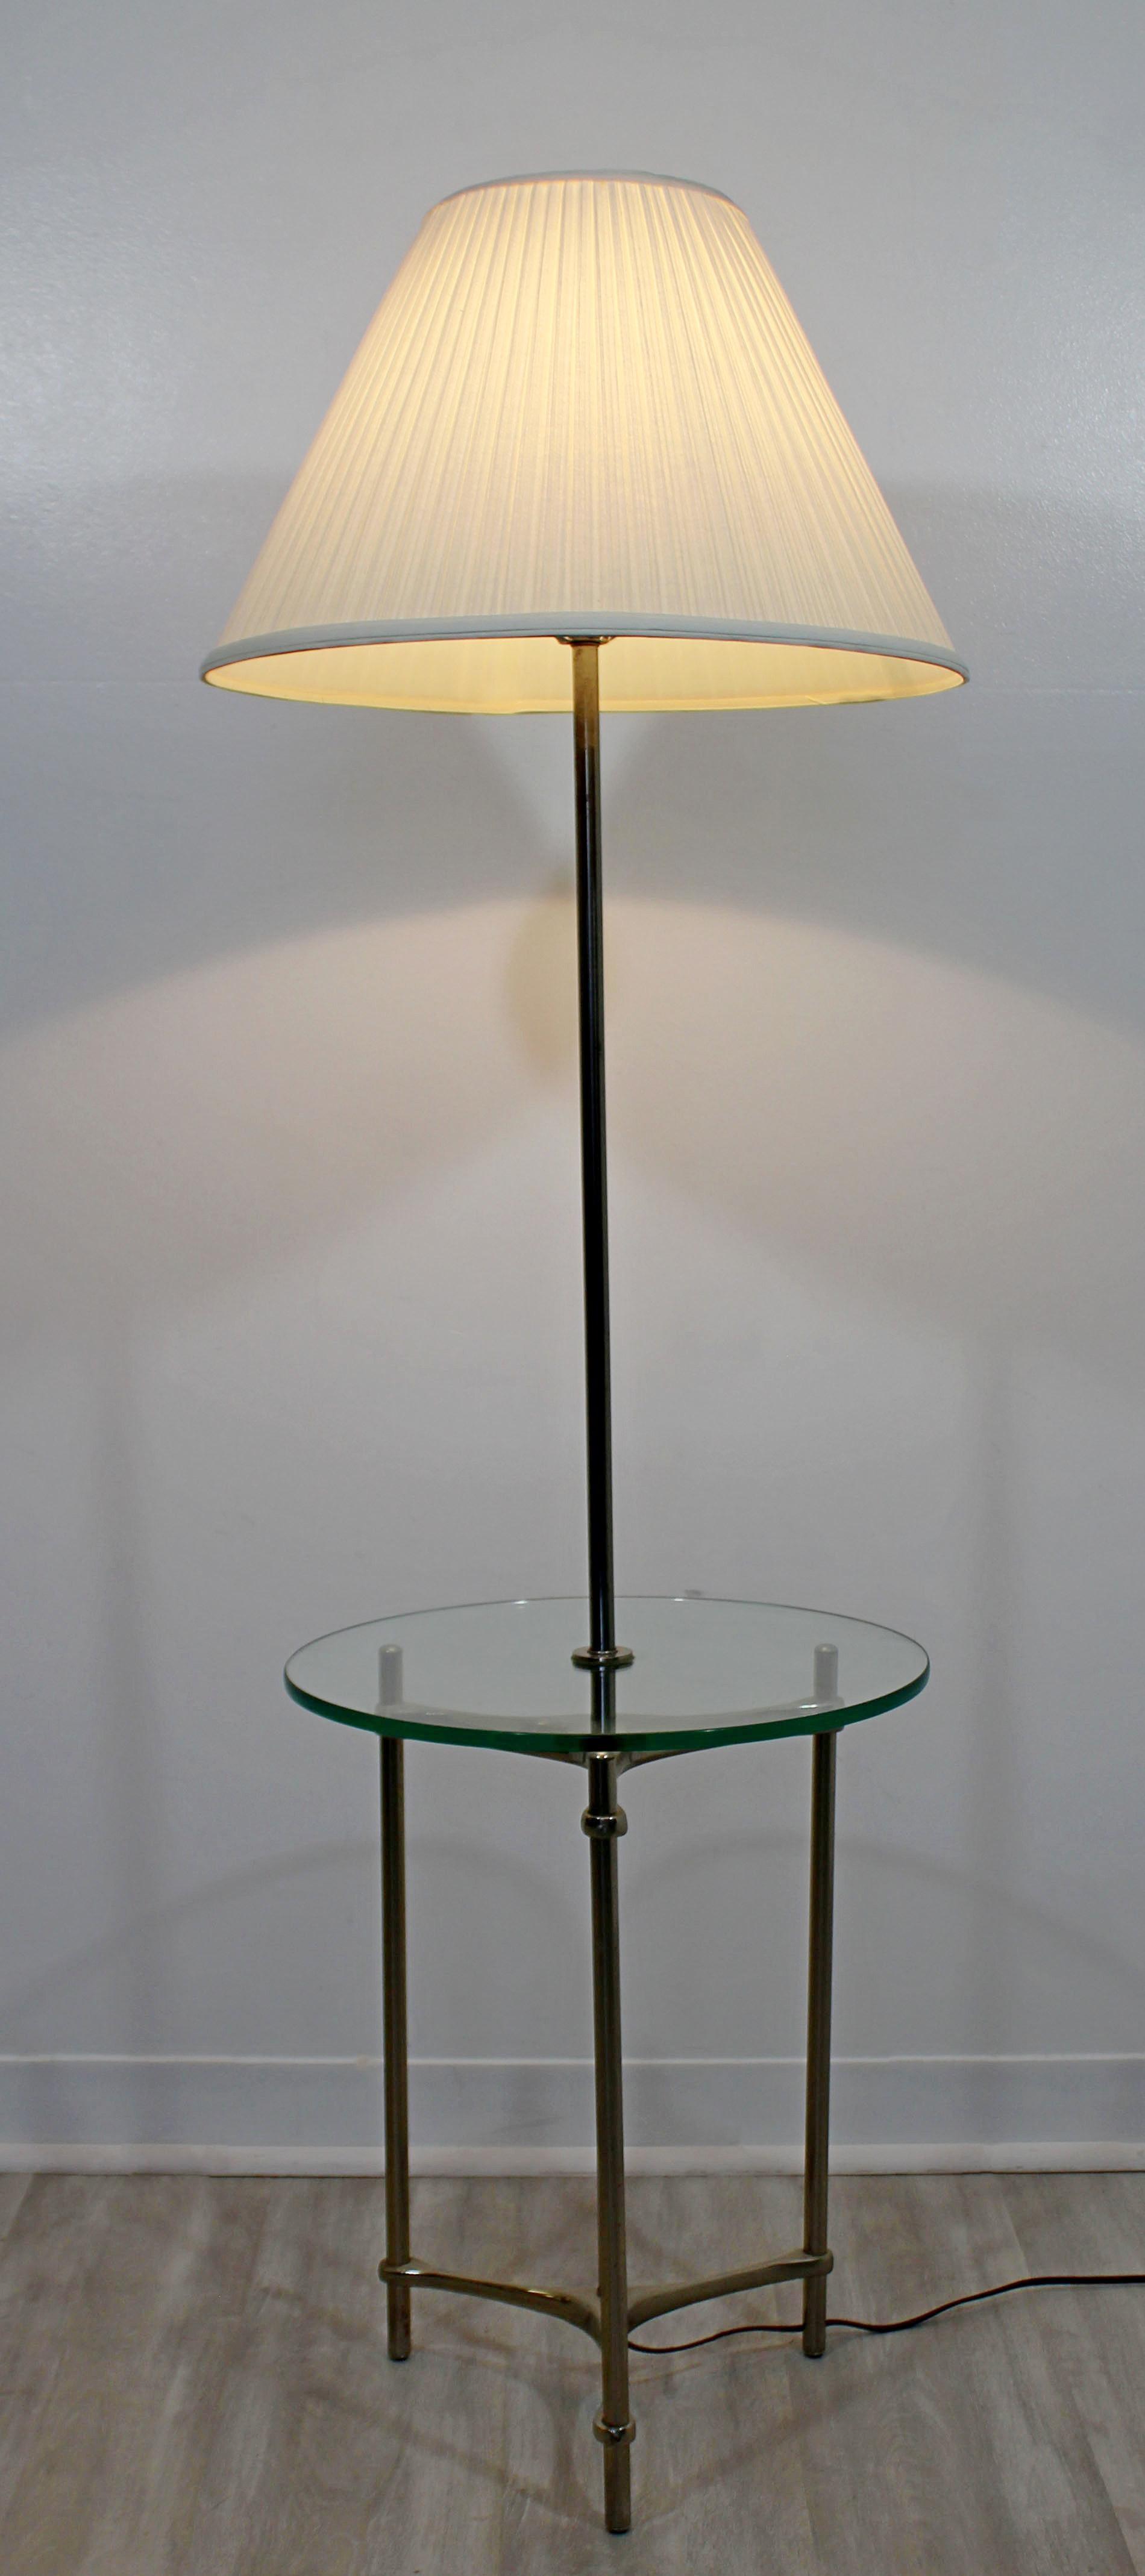 Mid Century Modern Laurel Aluminum Glass Tripod Floor Lamp Table Original Shade For Sale At 1stdibs